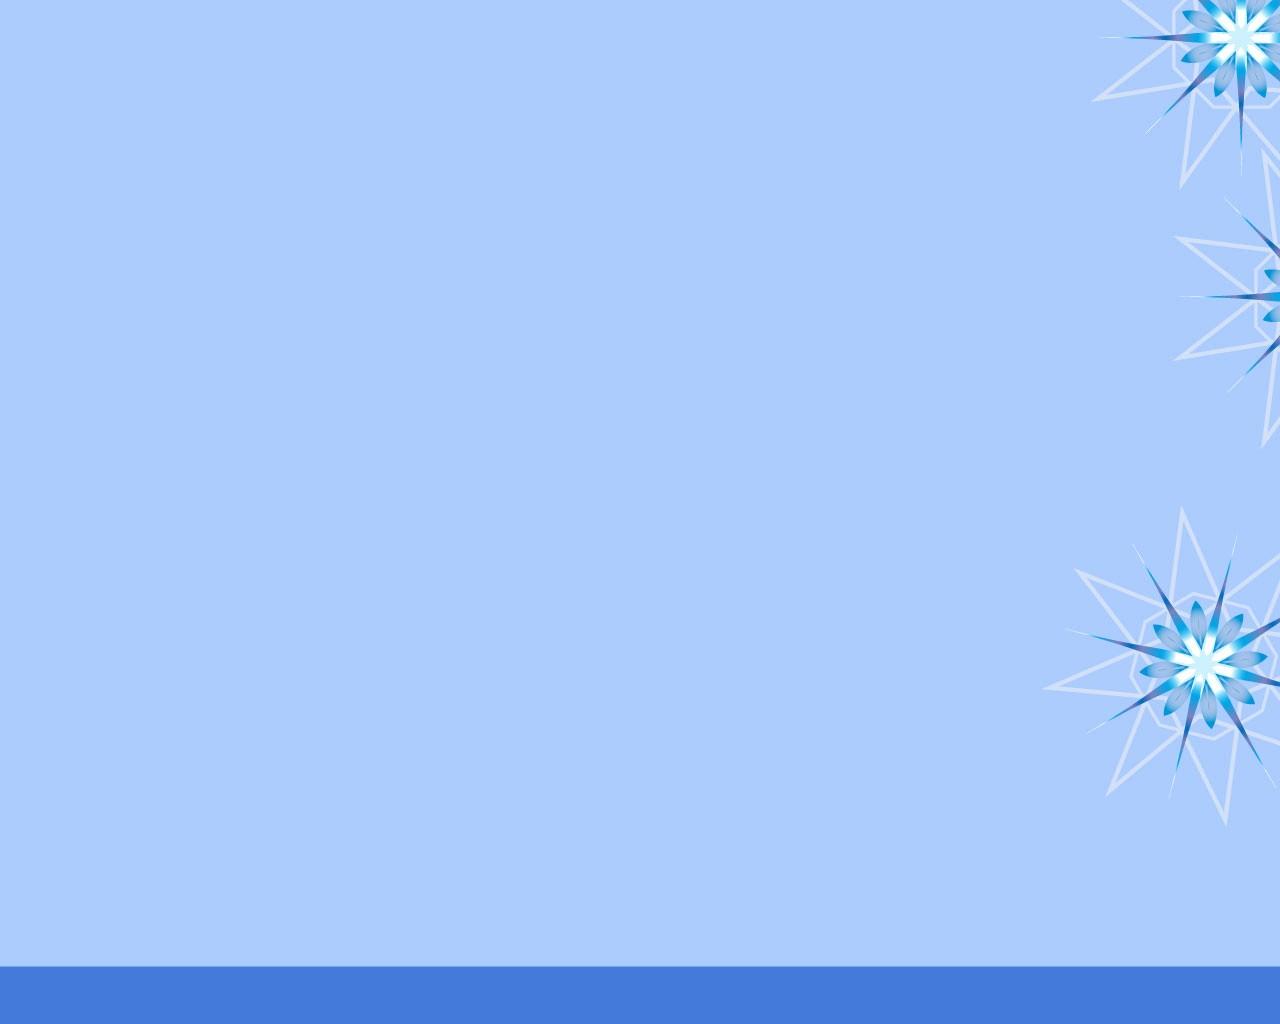 Microsoft Office Power Point Templates Elegant Microsoft Backgrounds Free Wallpapersafari